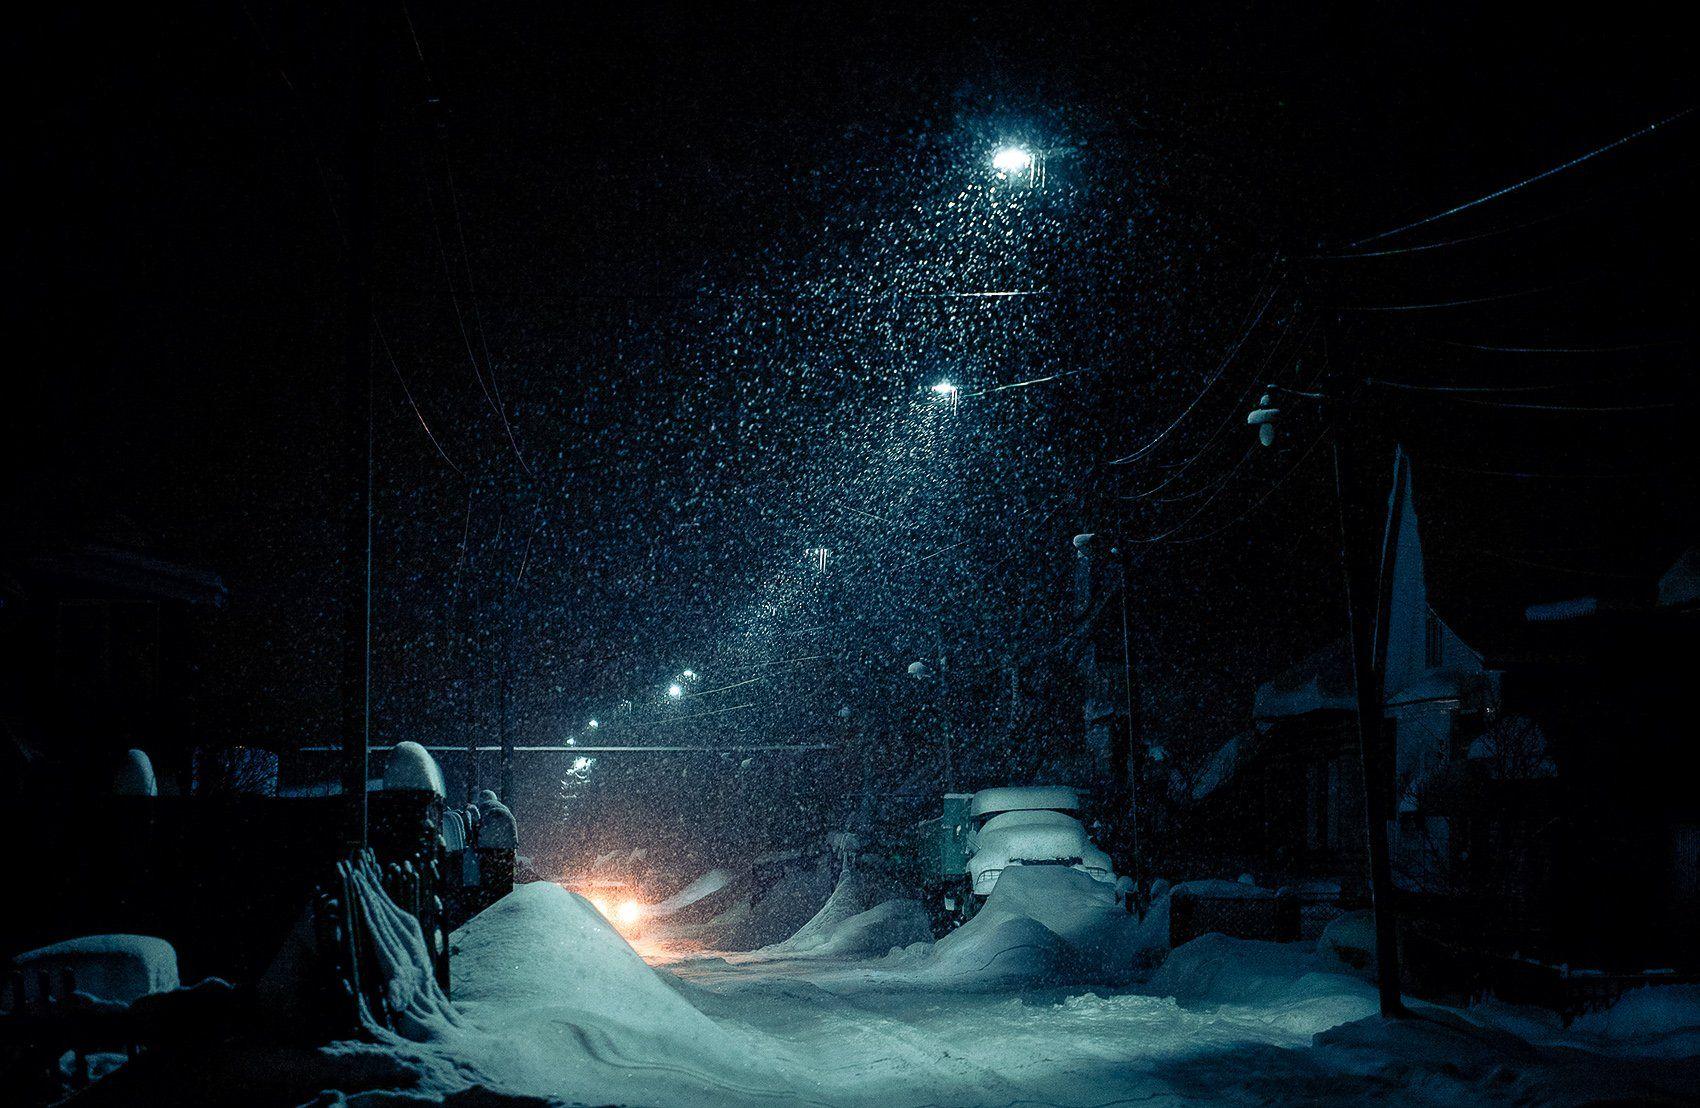 вечер, улица, фонарь, снегопад, дорога, Евгений Толкачёв